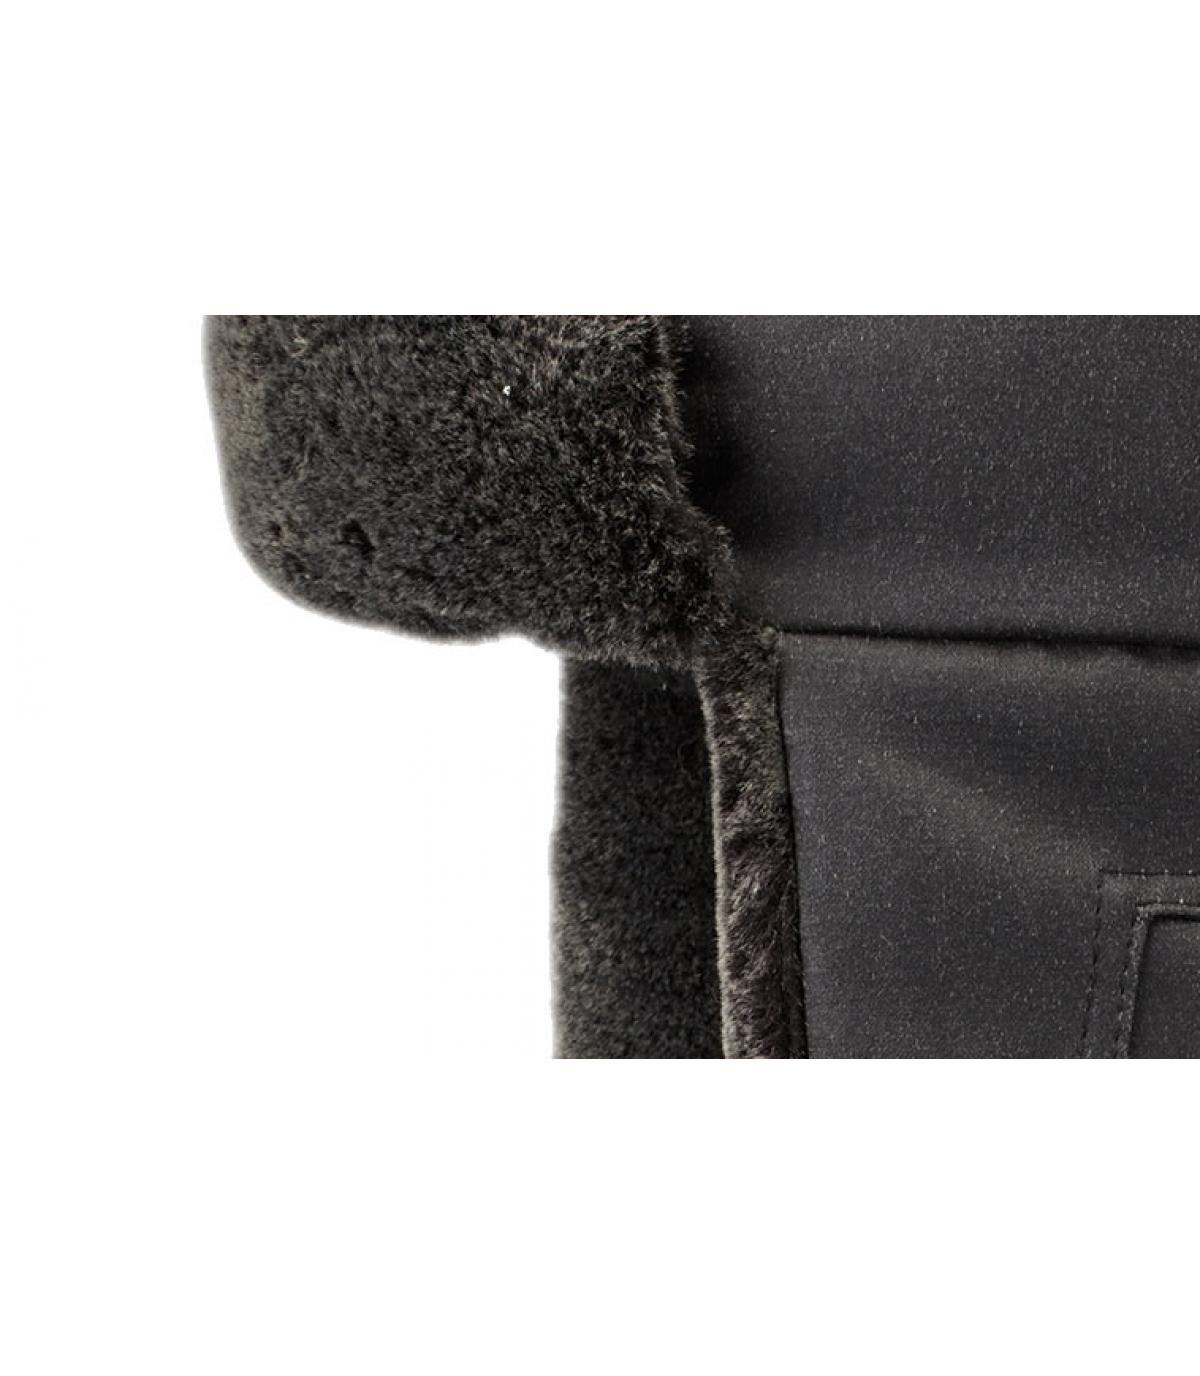 Details Bomber Cap CO PE Fake Fur black - Abbildung 3